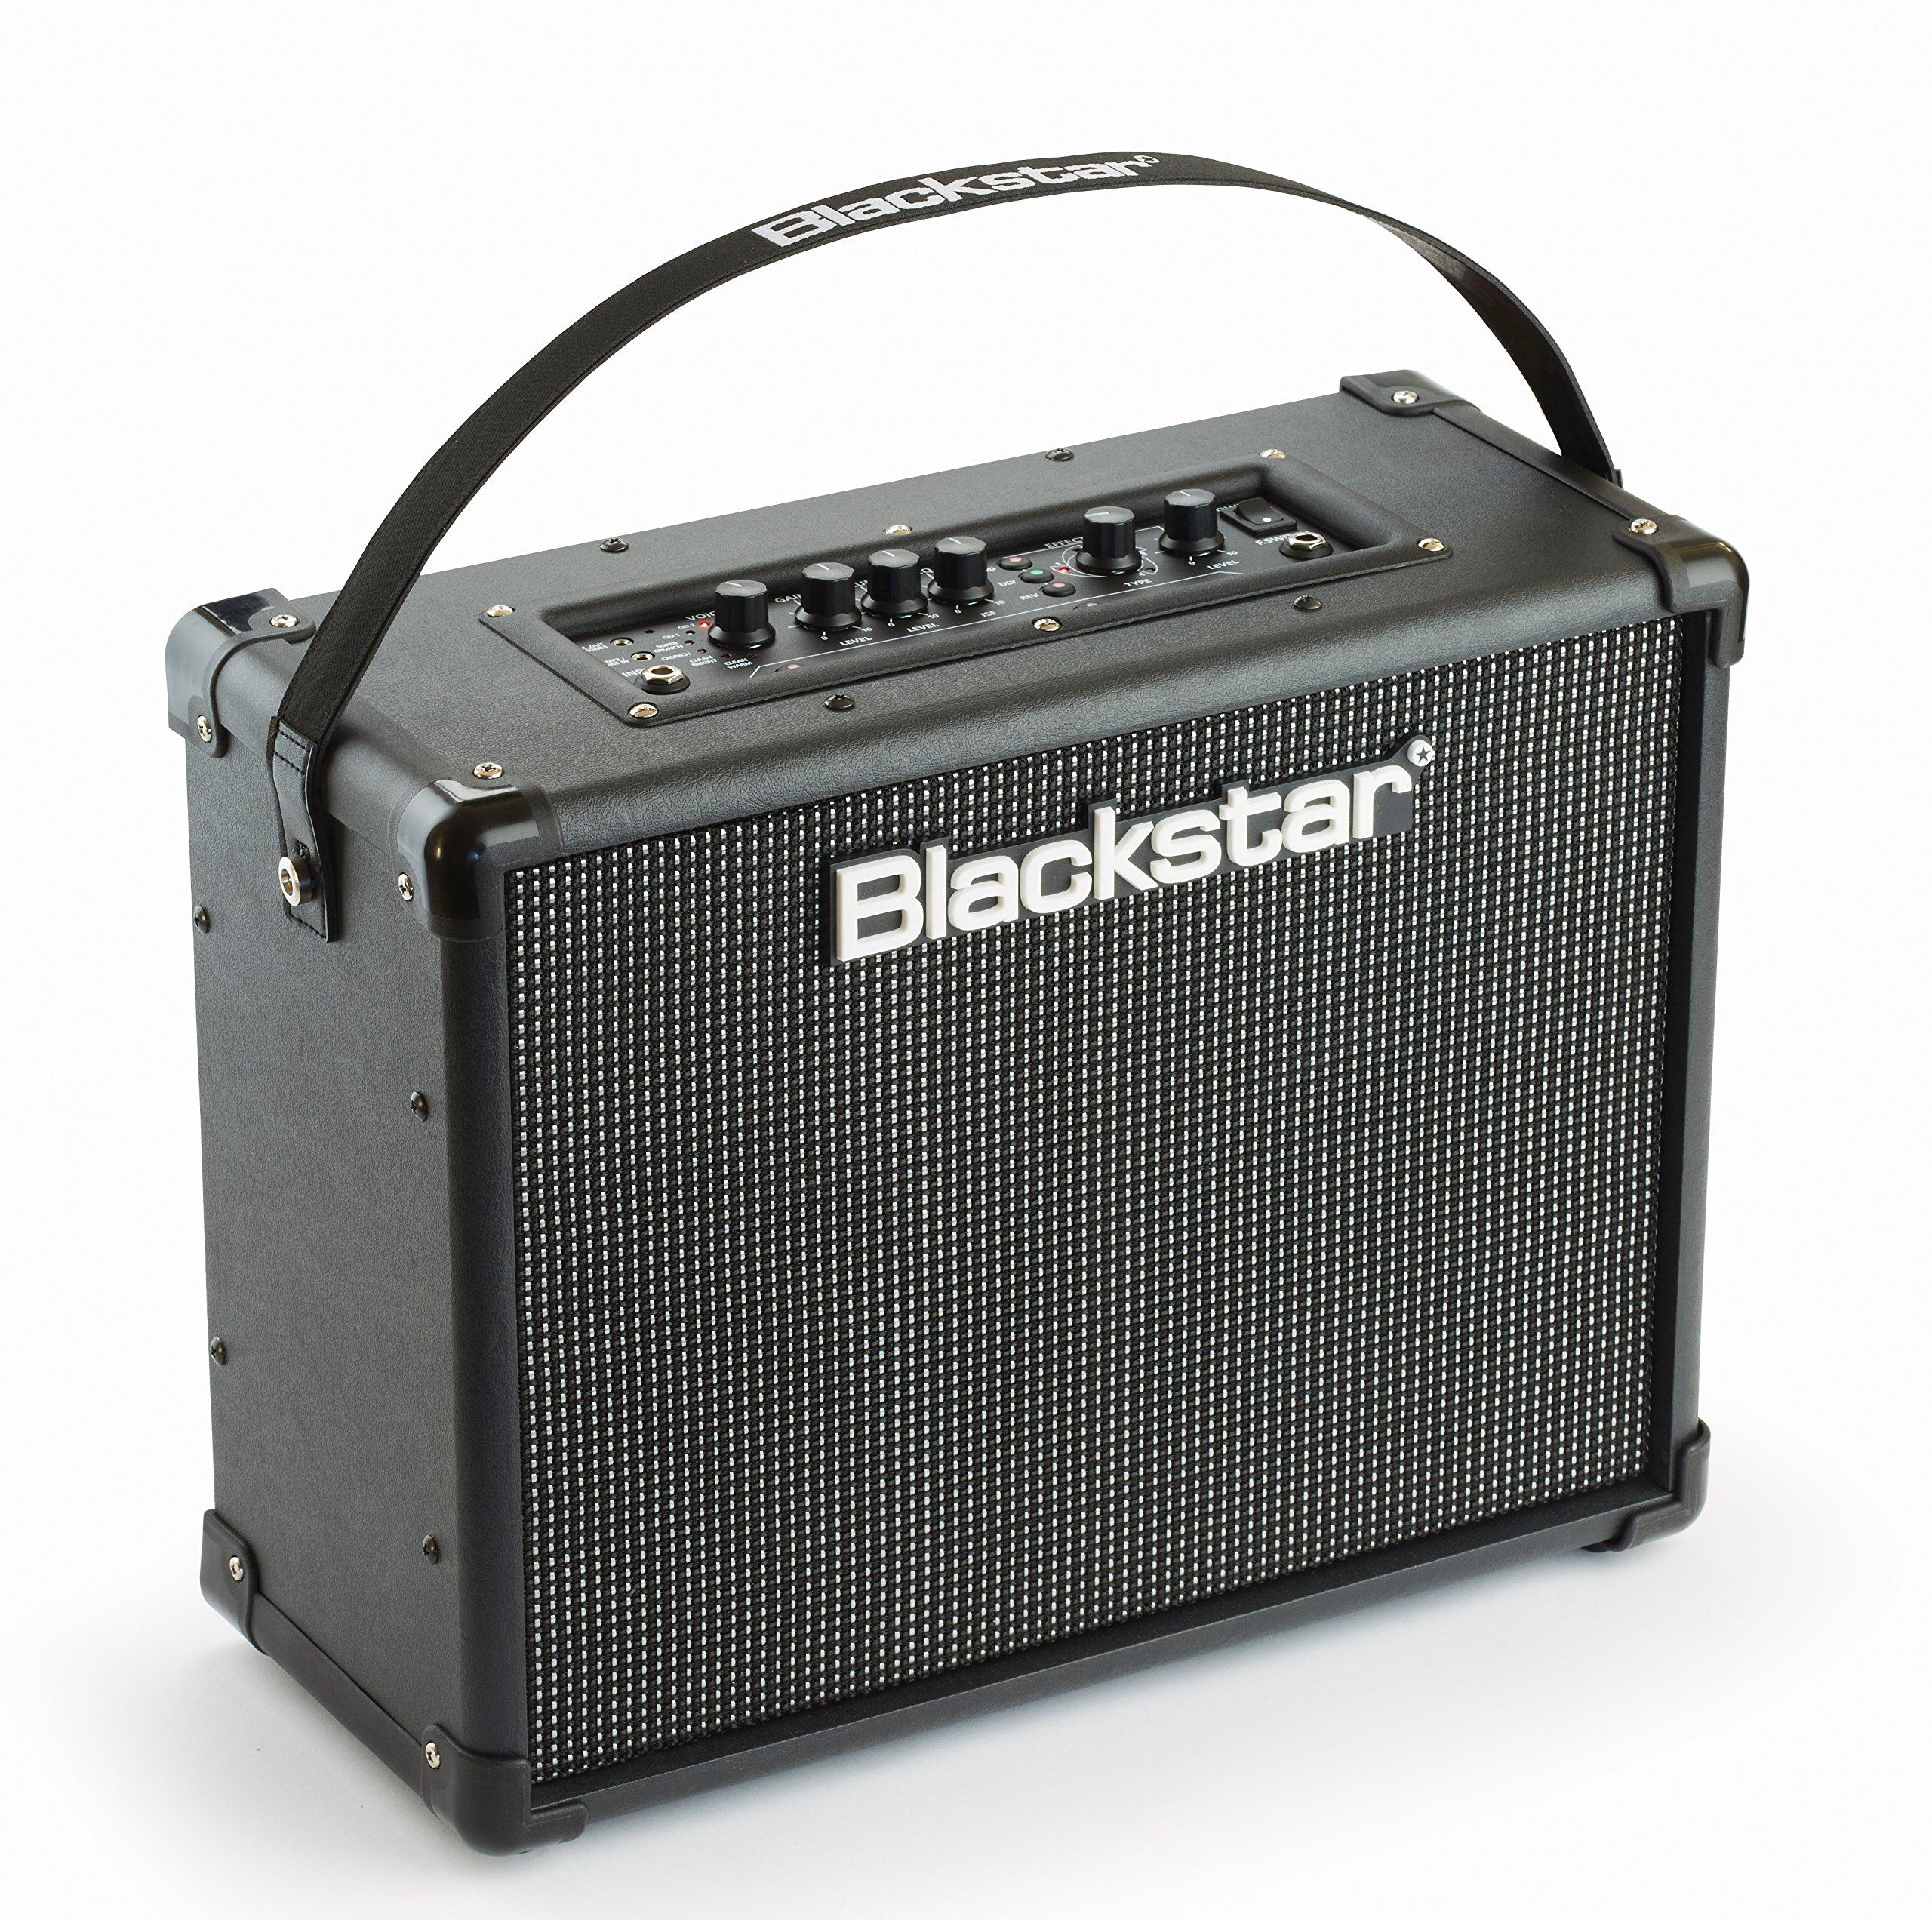 Blackstar IDCORE40 Guitar Combo Amplifier, 40W